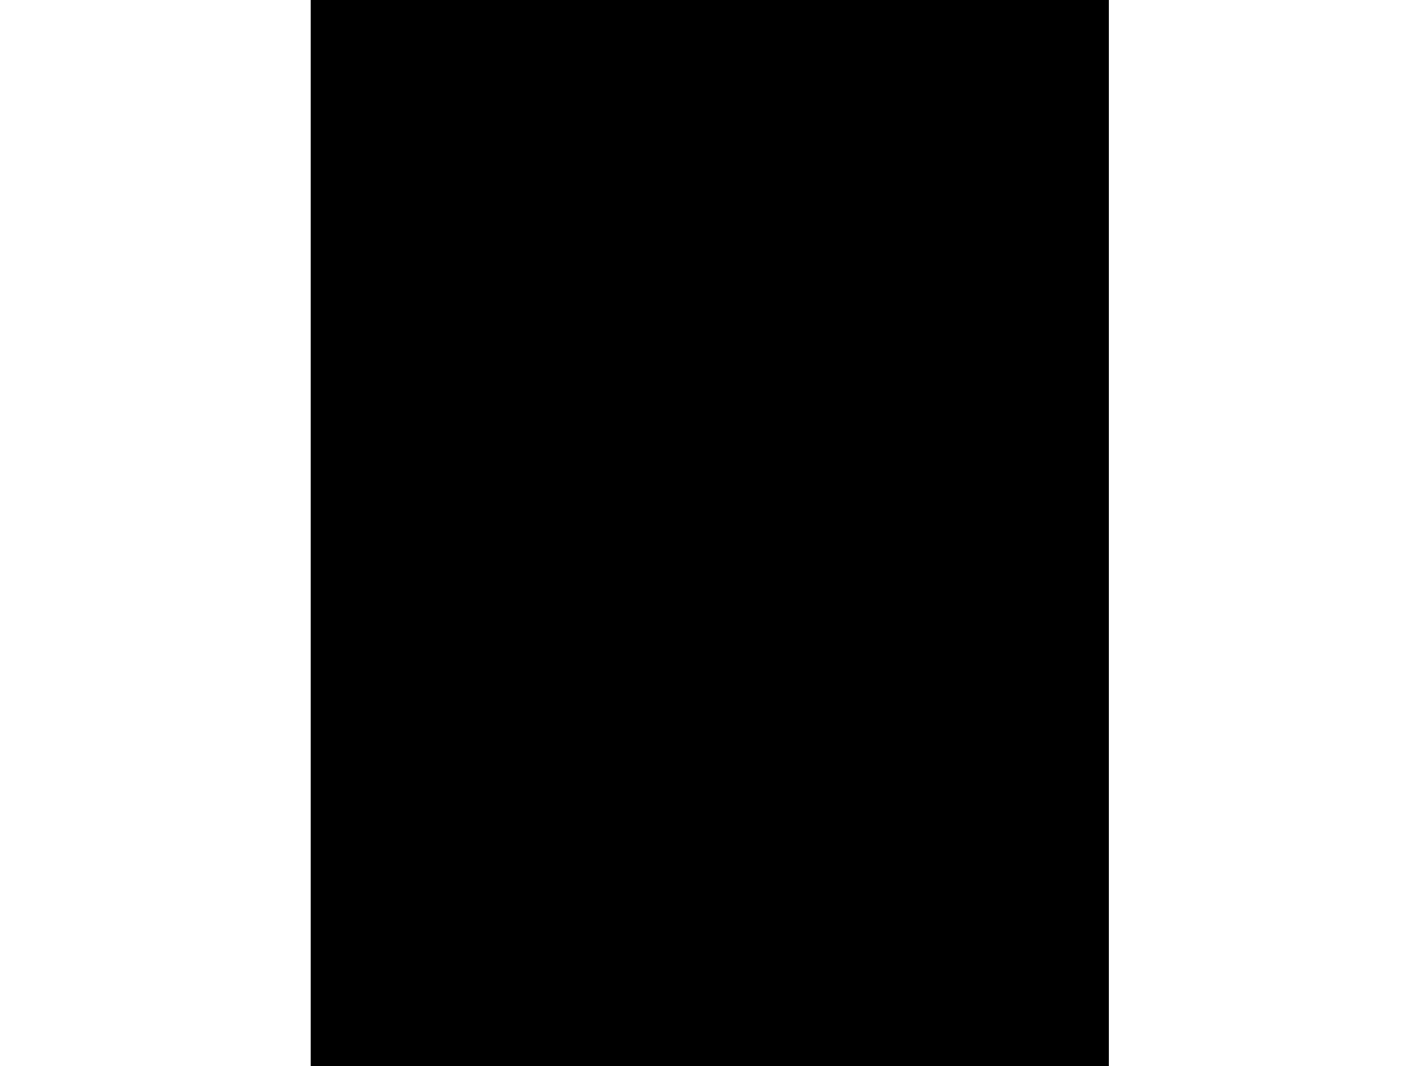 PA Framing ADF WhtCore 5pc Mat Blanks 9x12 Black